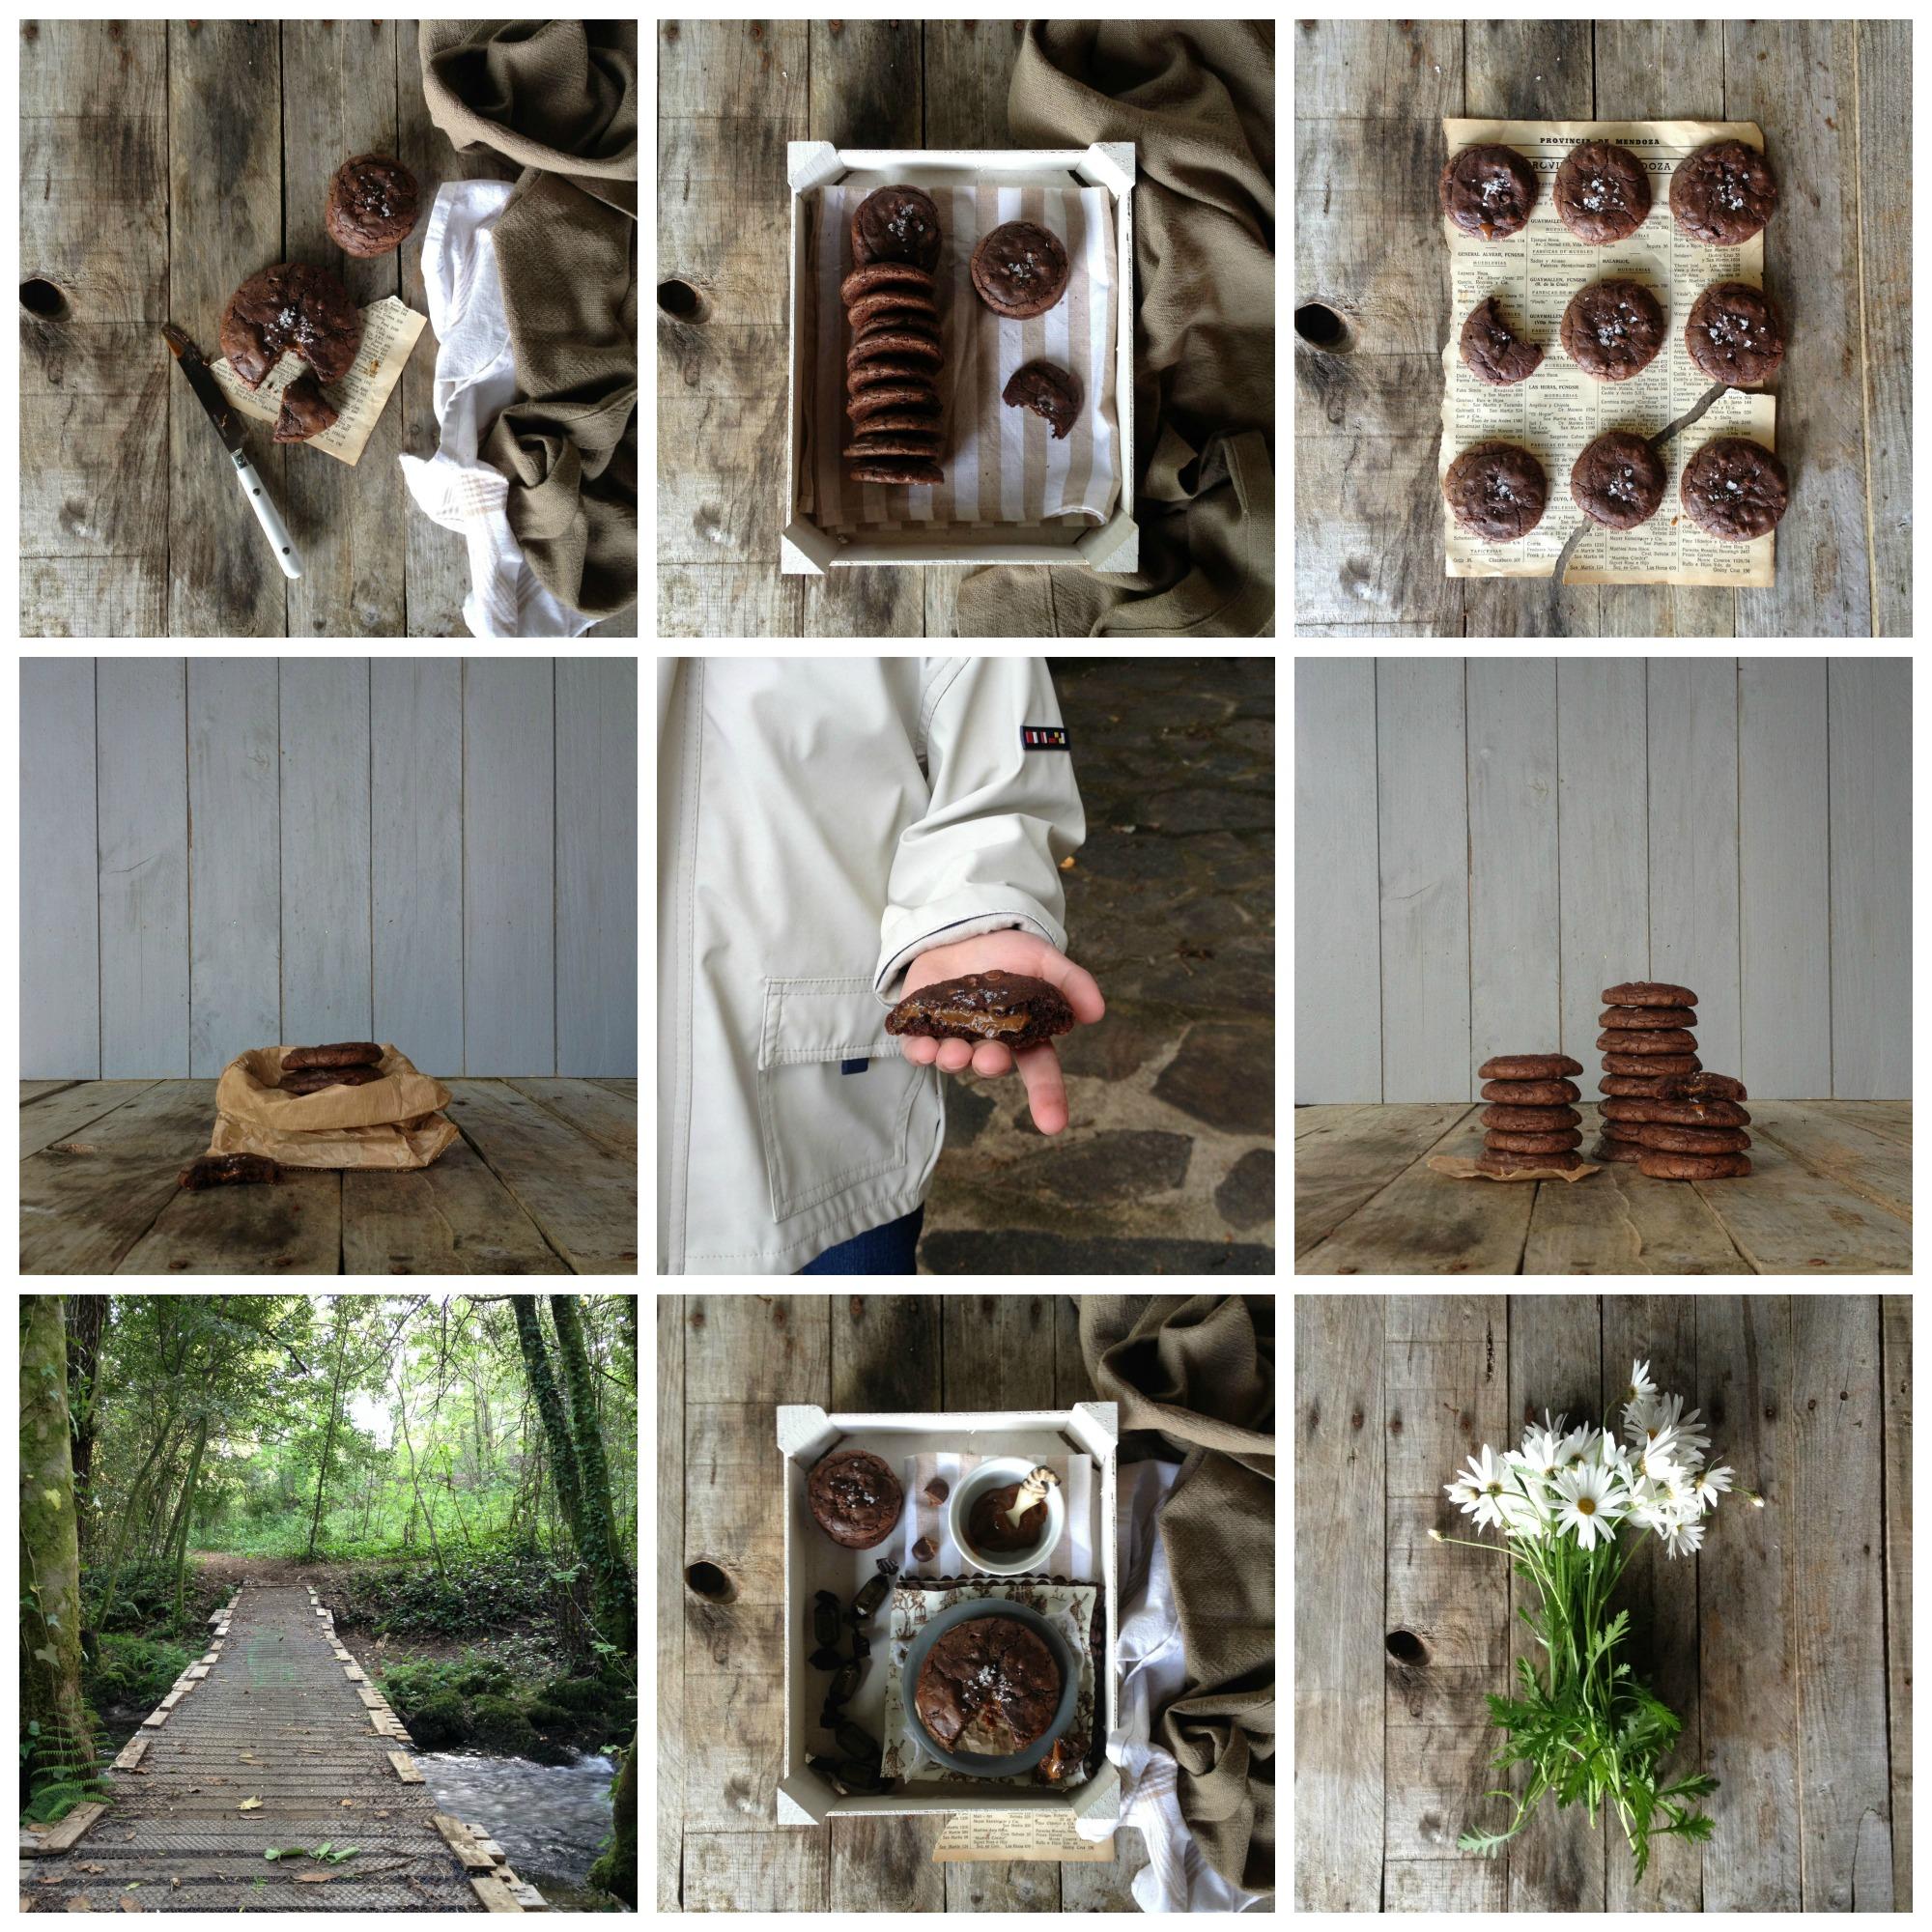 galletas de chocolate rellenas de dulce de leche